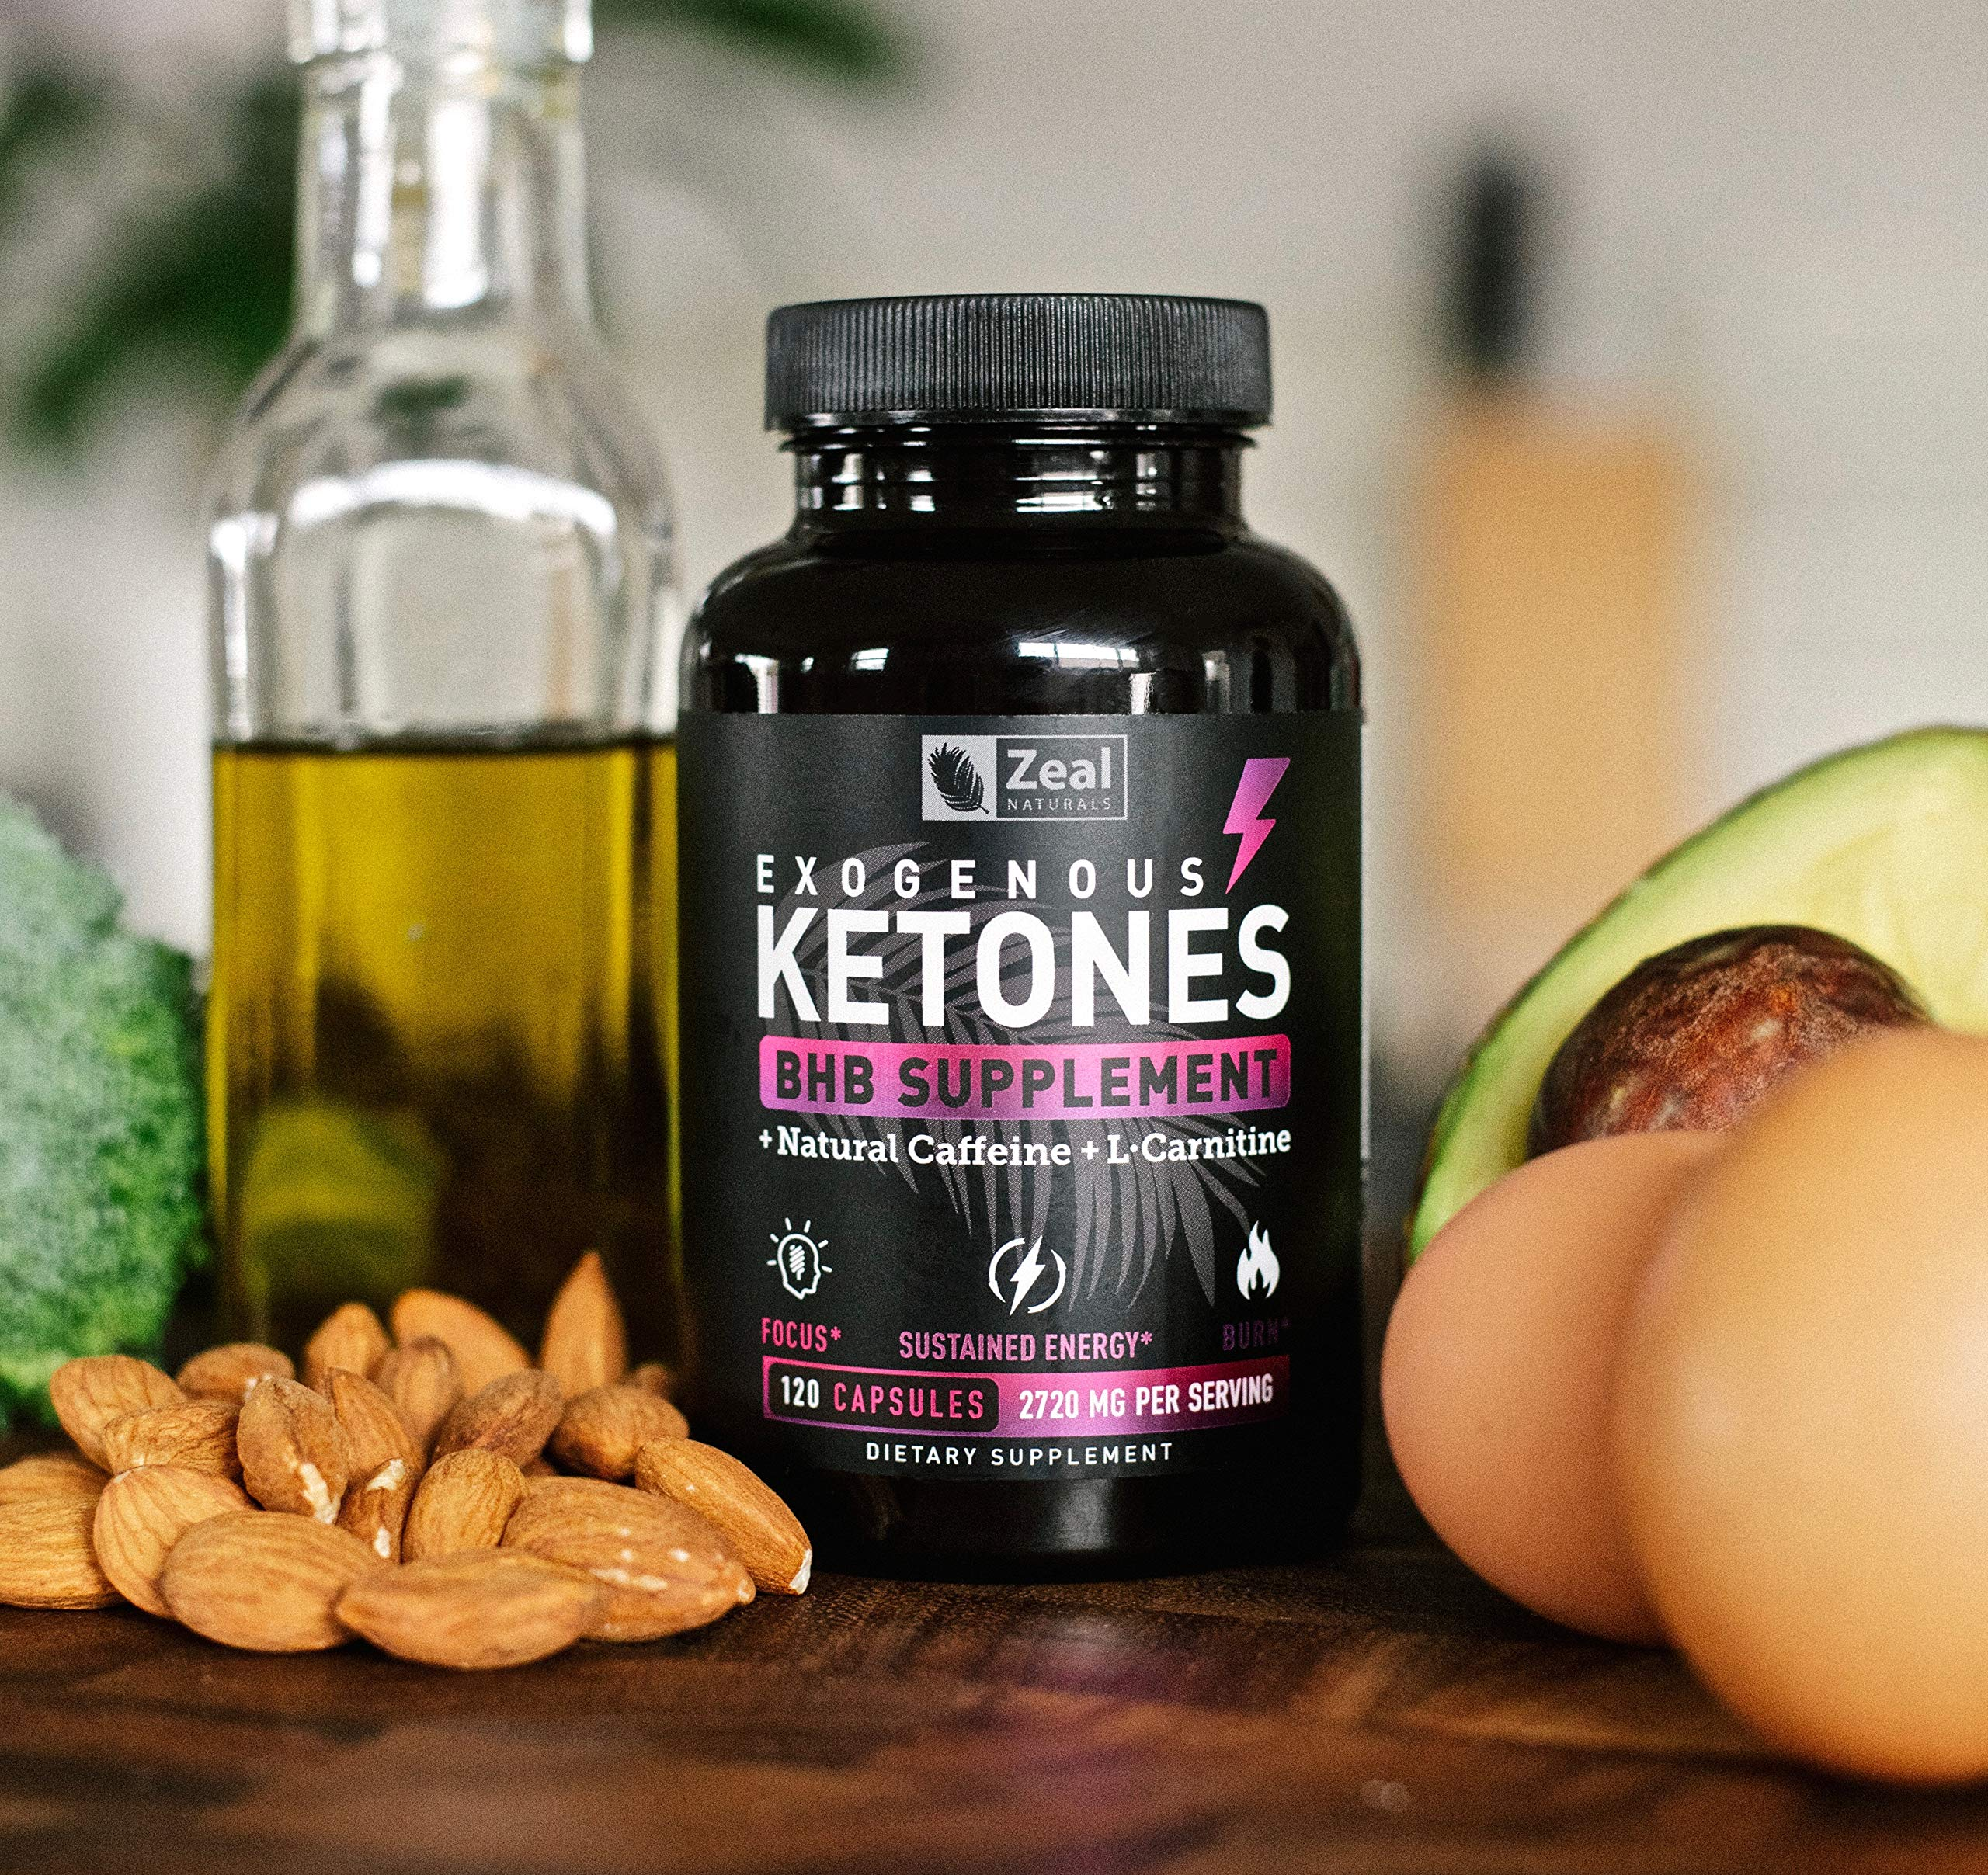 Keto BHB Exogenous Ketones Pills (2720mg | 120 Capsules) Keto Pills w. goBHB Salts, Natural Caffeine & L-Carnitine - Keto BHB Oil Capsules Beta Hydroxybutyrate for Weight Loss Keto Vitamins Keto Salts by Zeal Naturals (Image #8)